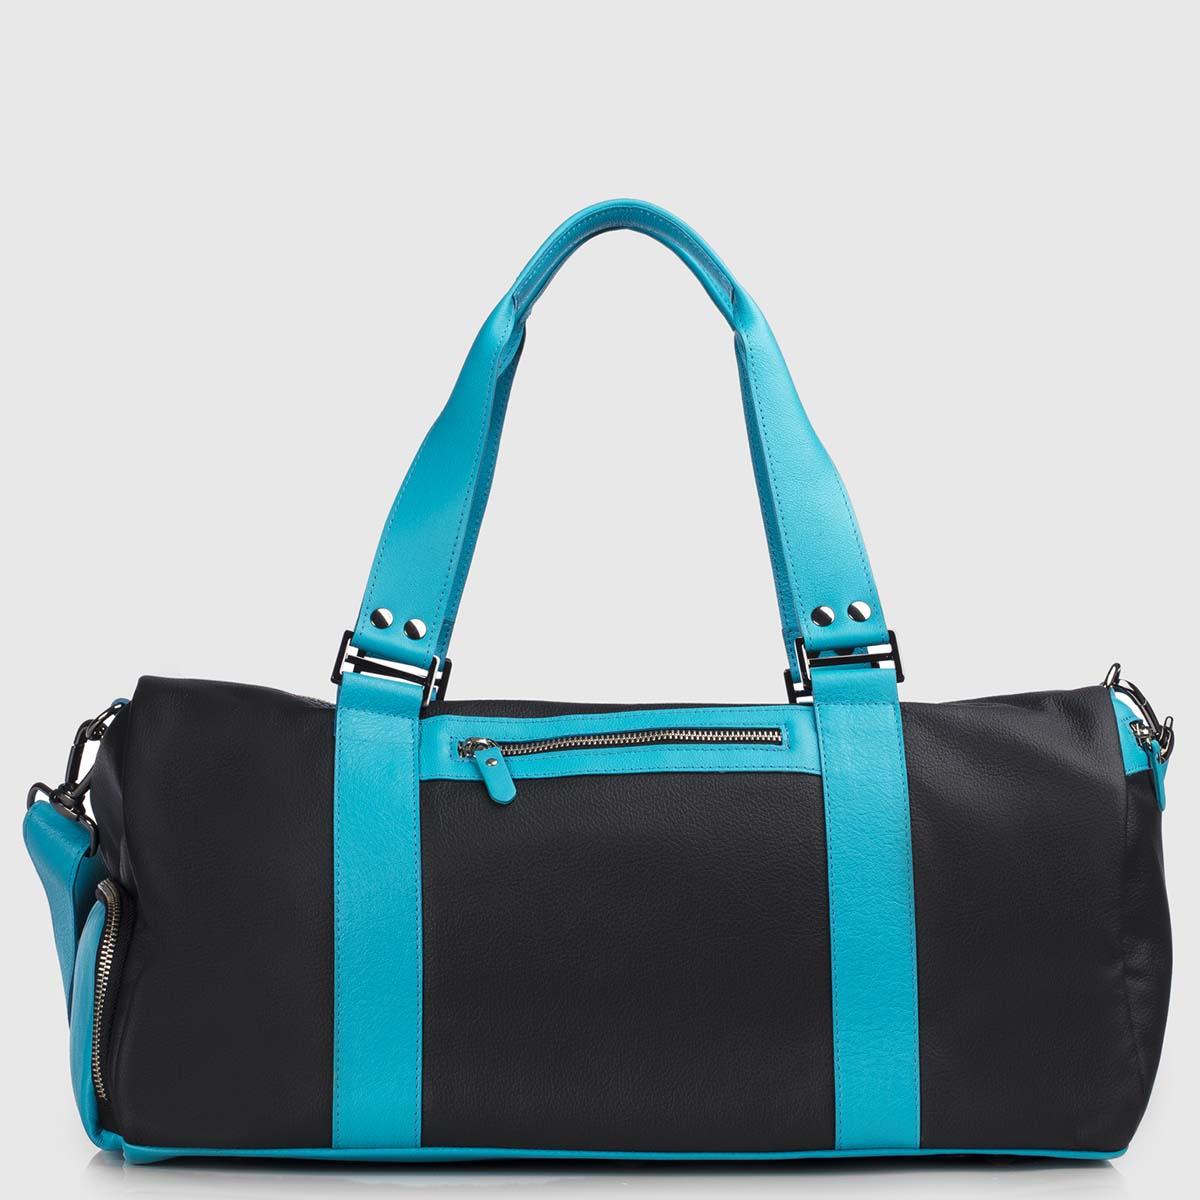 Celestial & Black Leather Duffle-bag